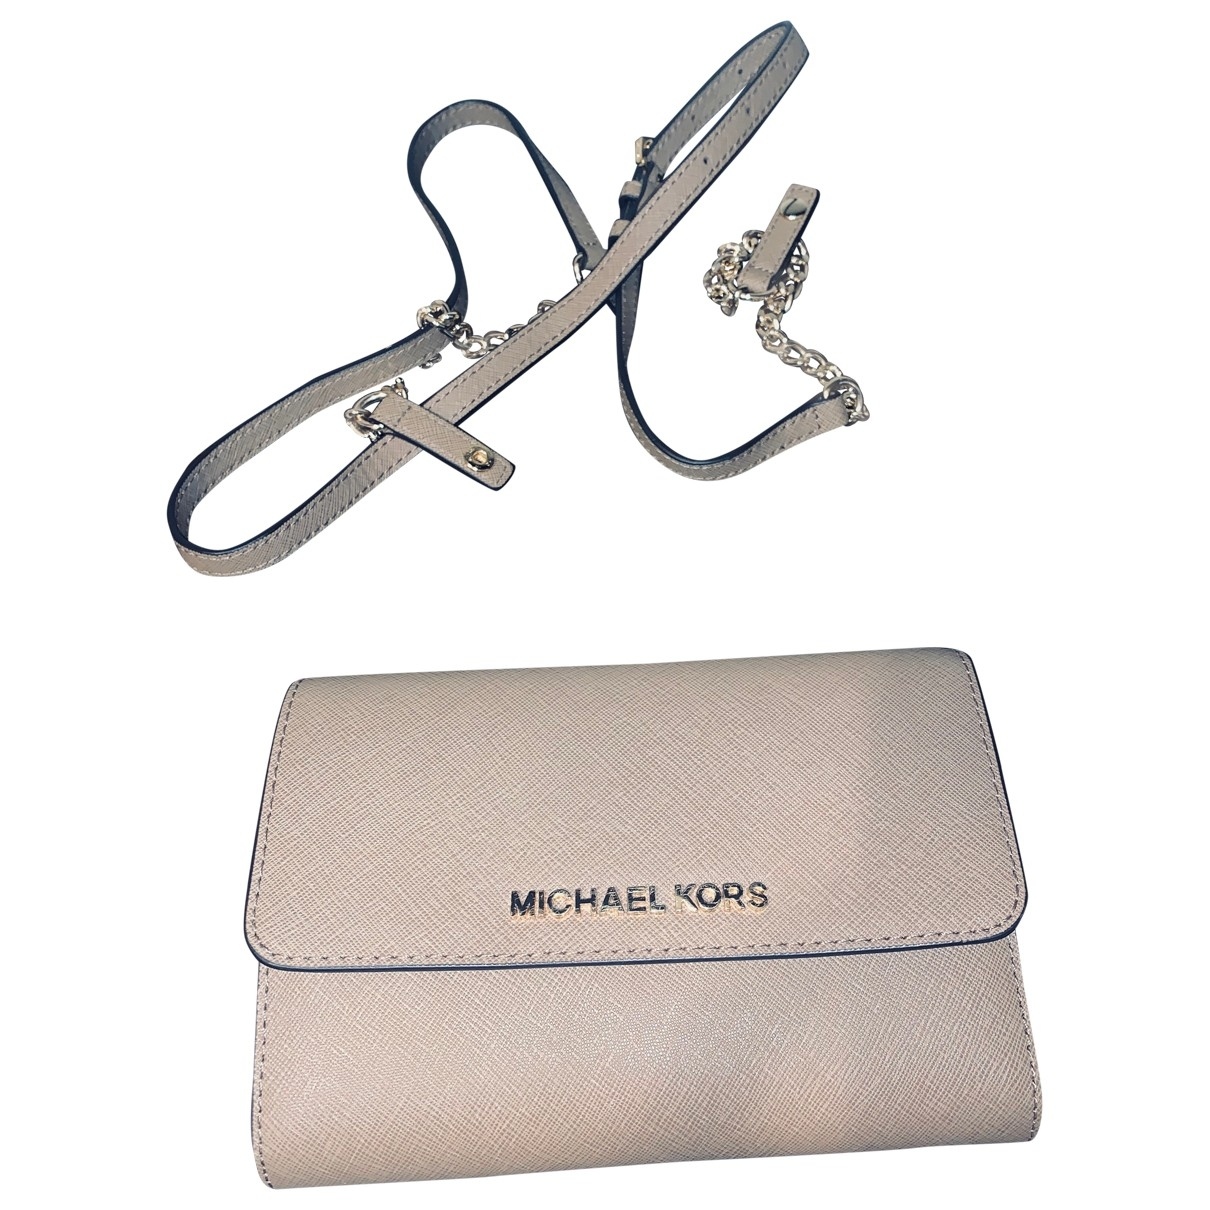 Michael Kors \N Beige Leather handbag for Women \N